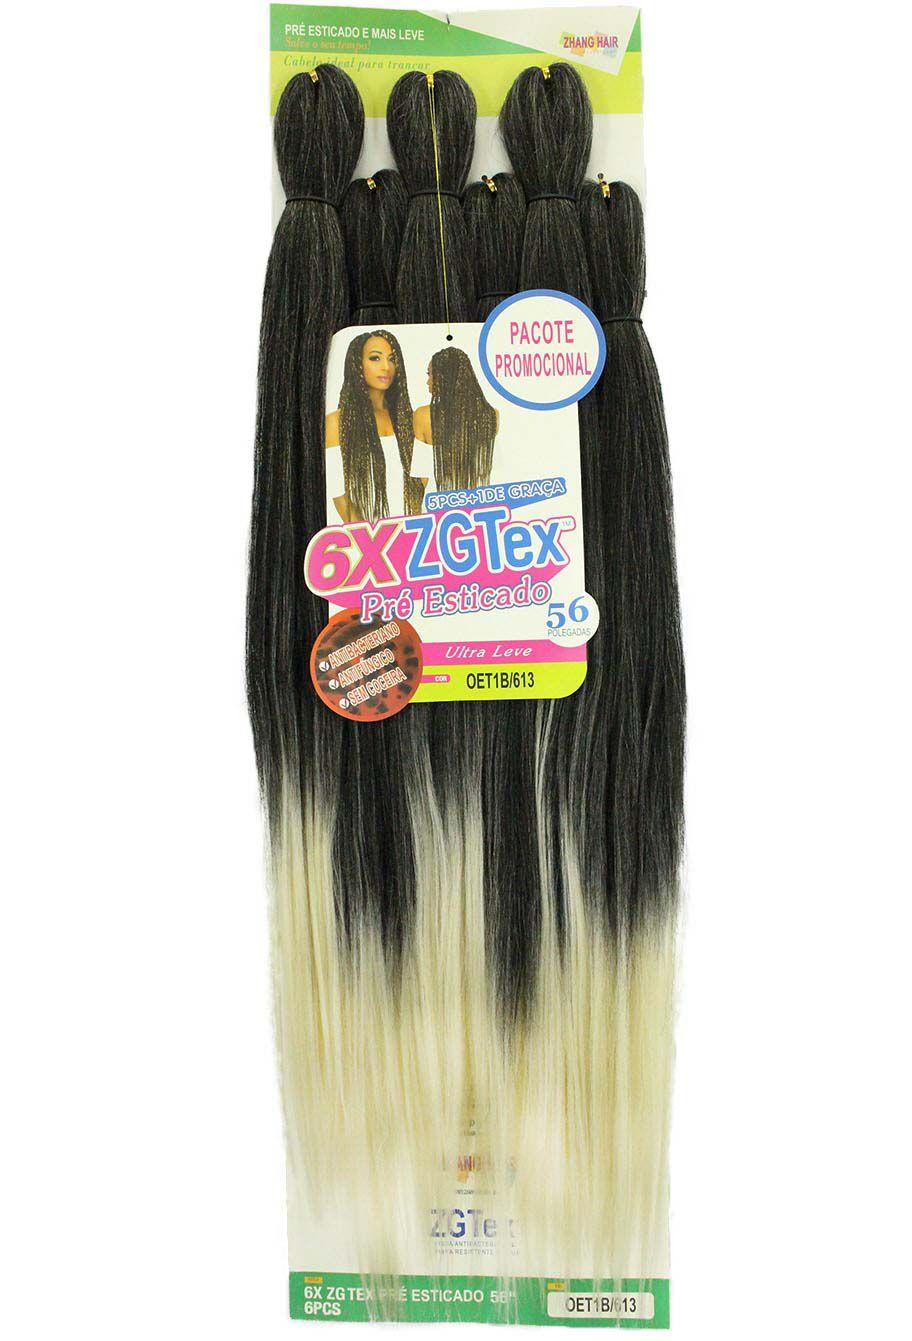 Jumbo - Zhang Hair - 6X ZGTex (400g) - Cor: OET1B/613